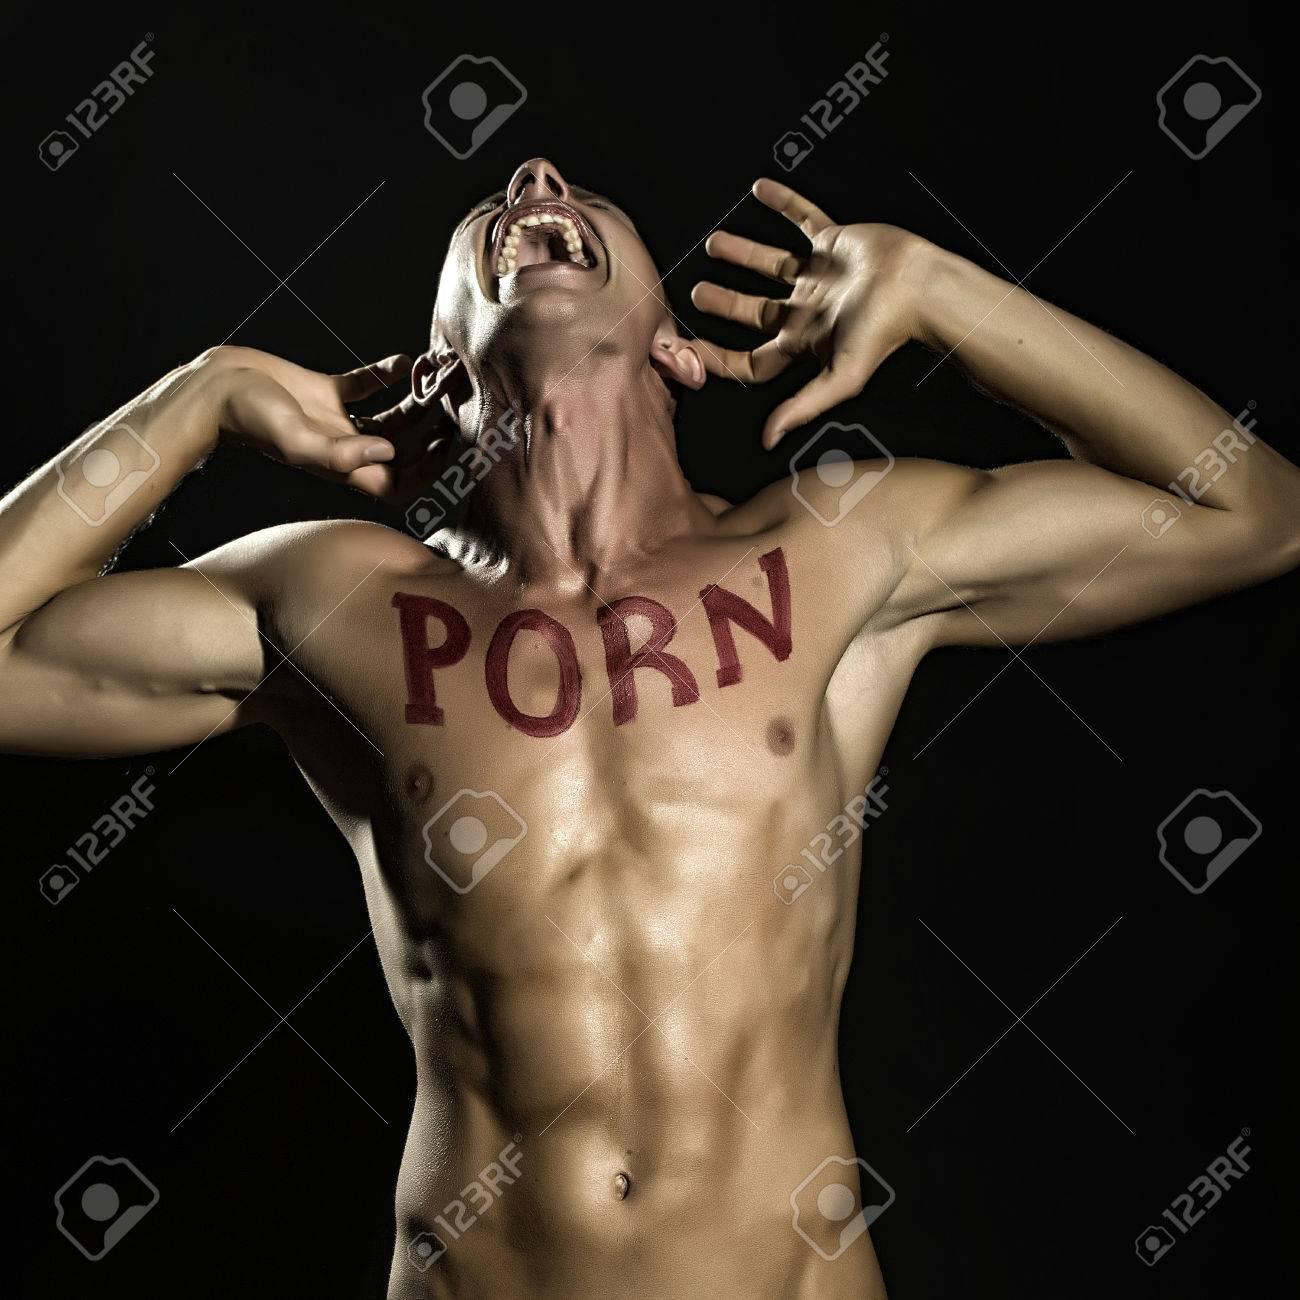 Modèle porno masculin